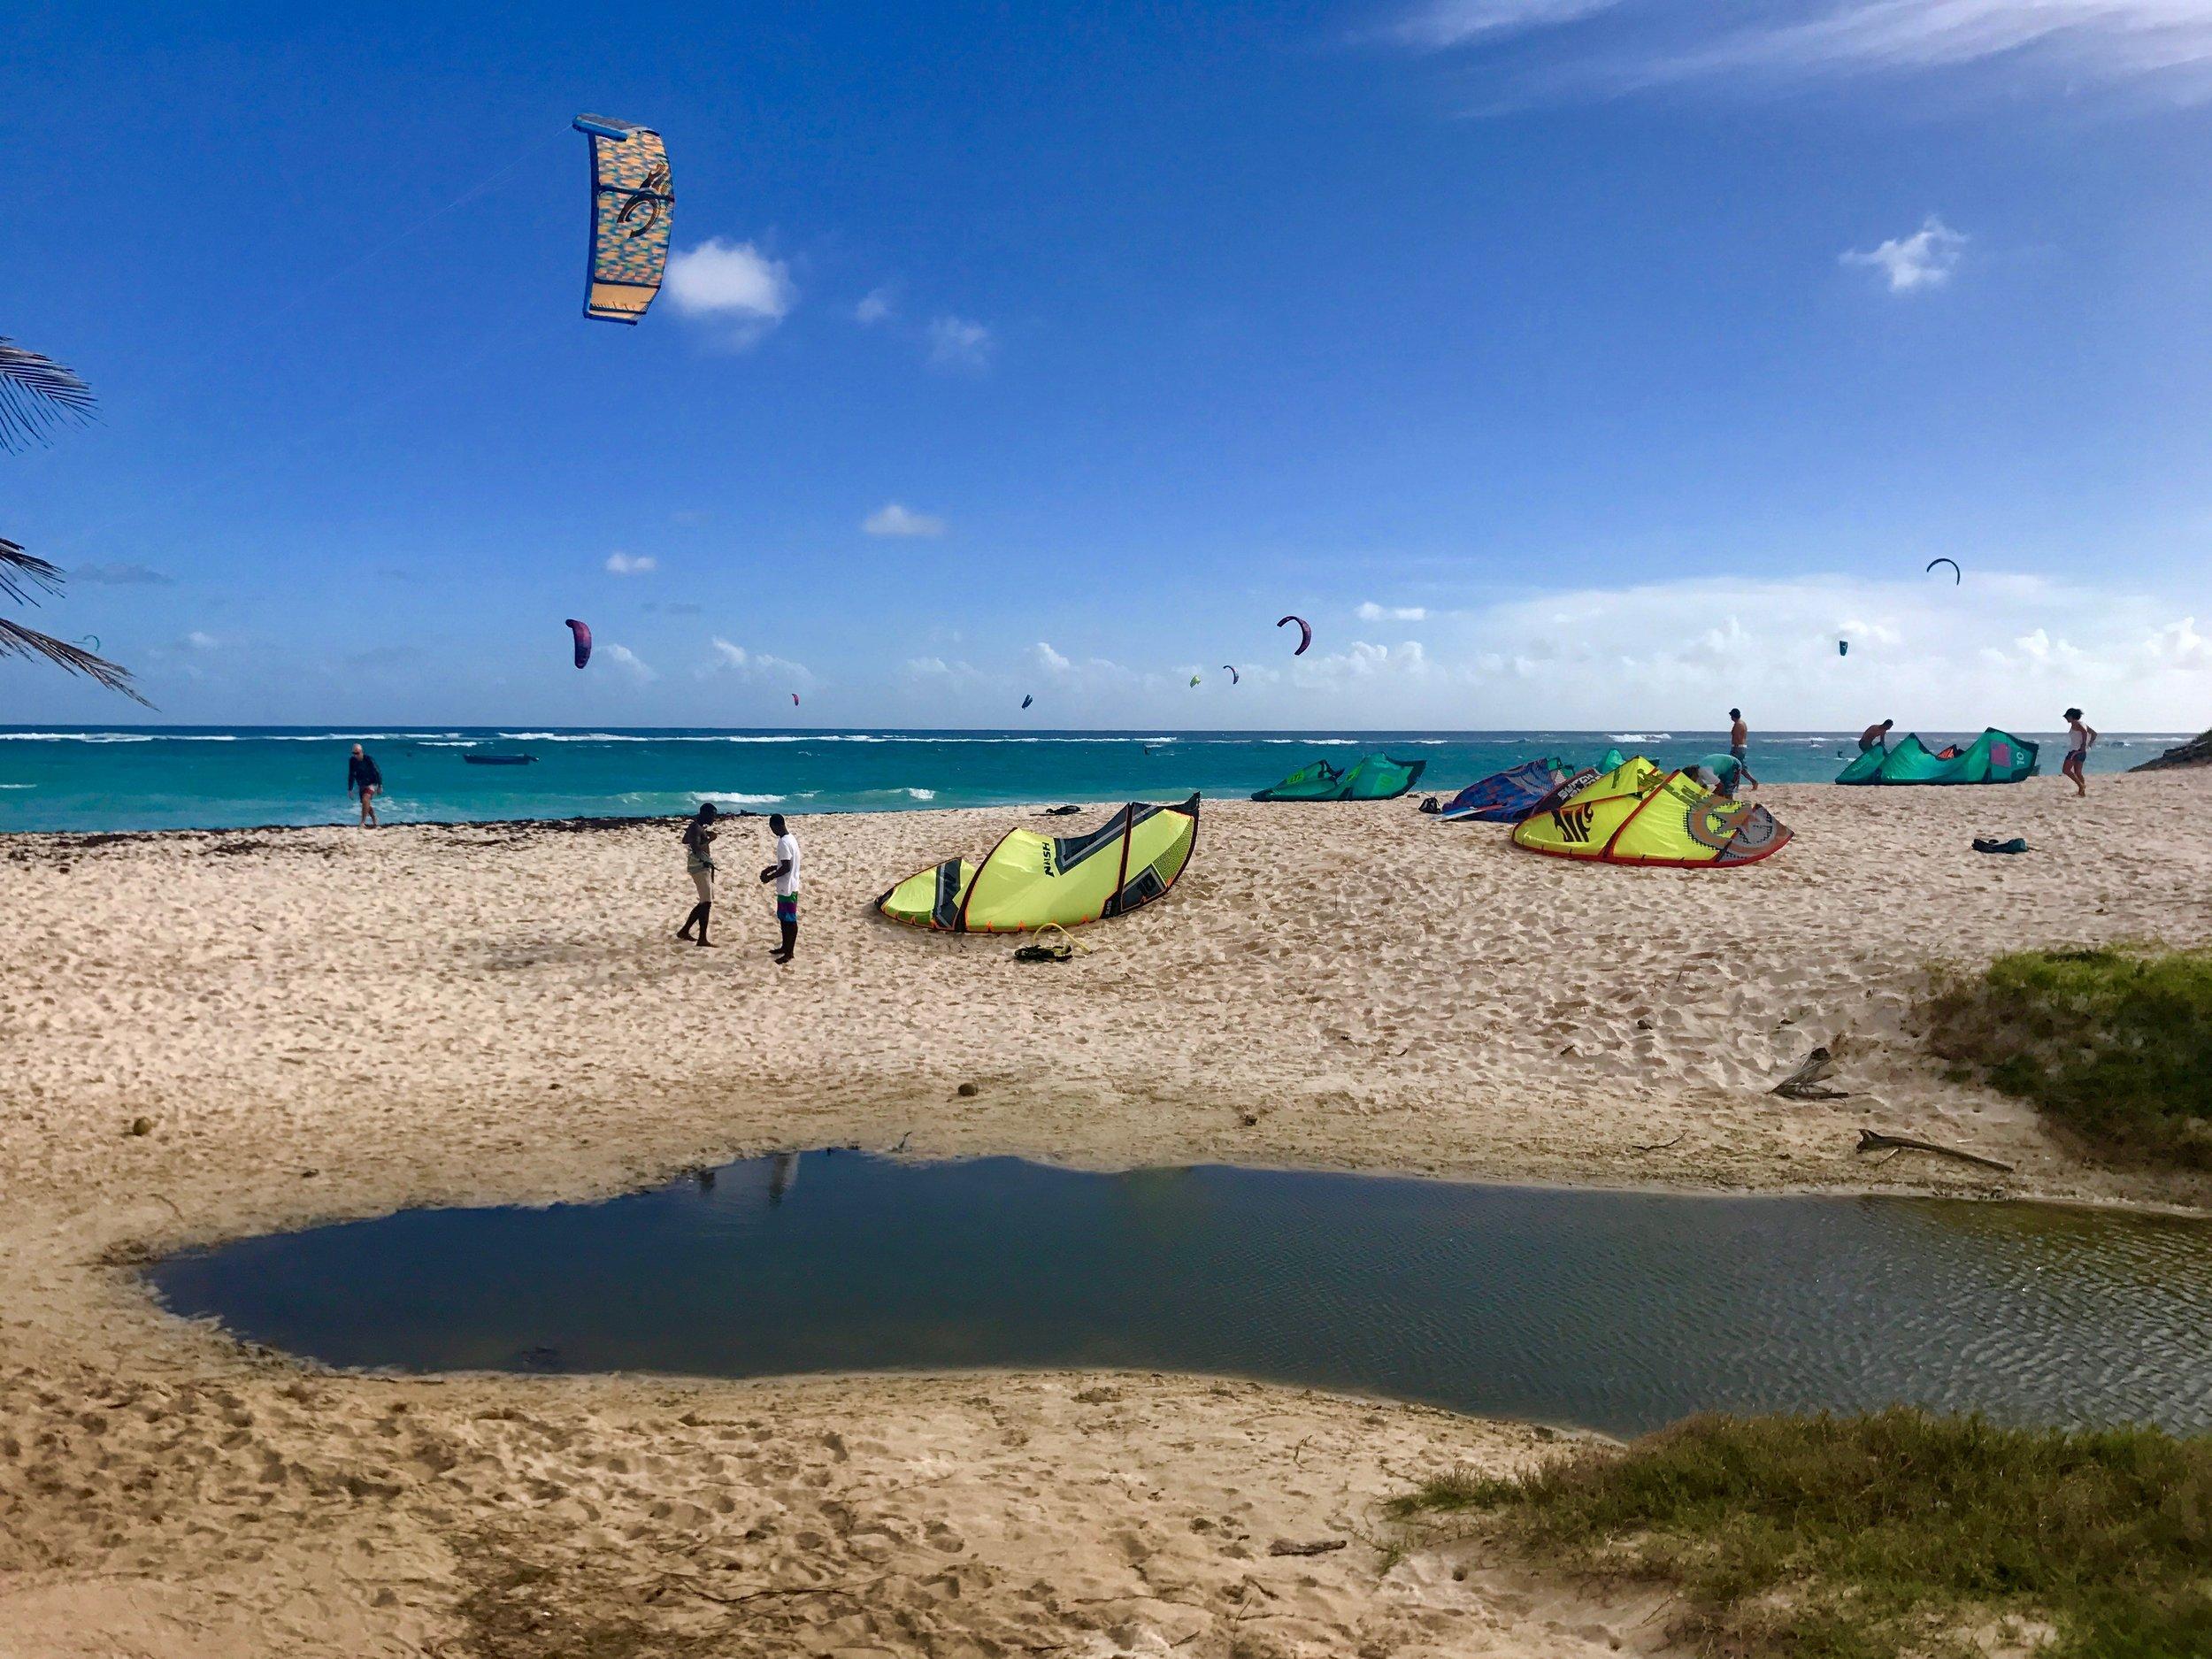 Silver Sands beach, Barbados